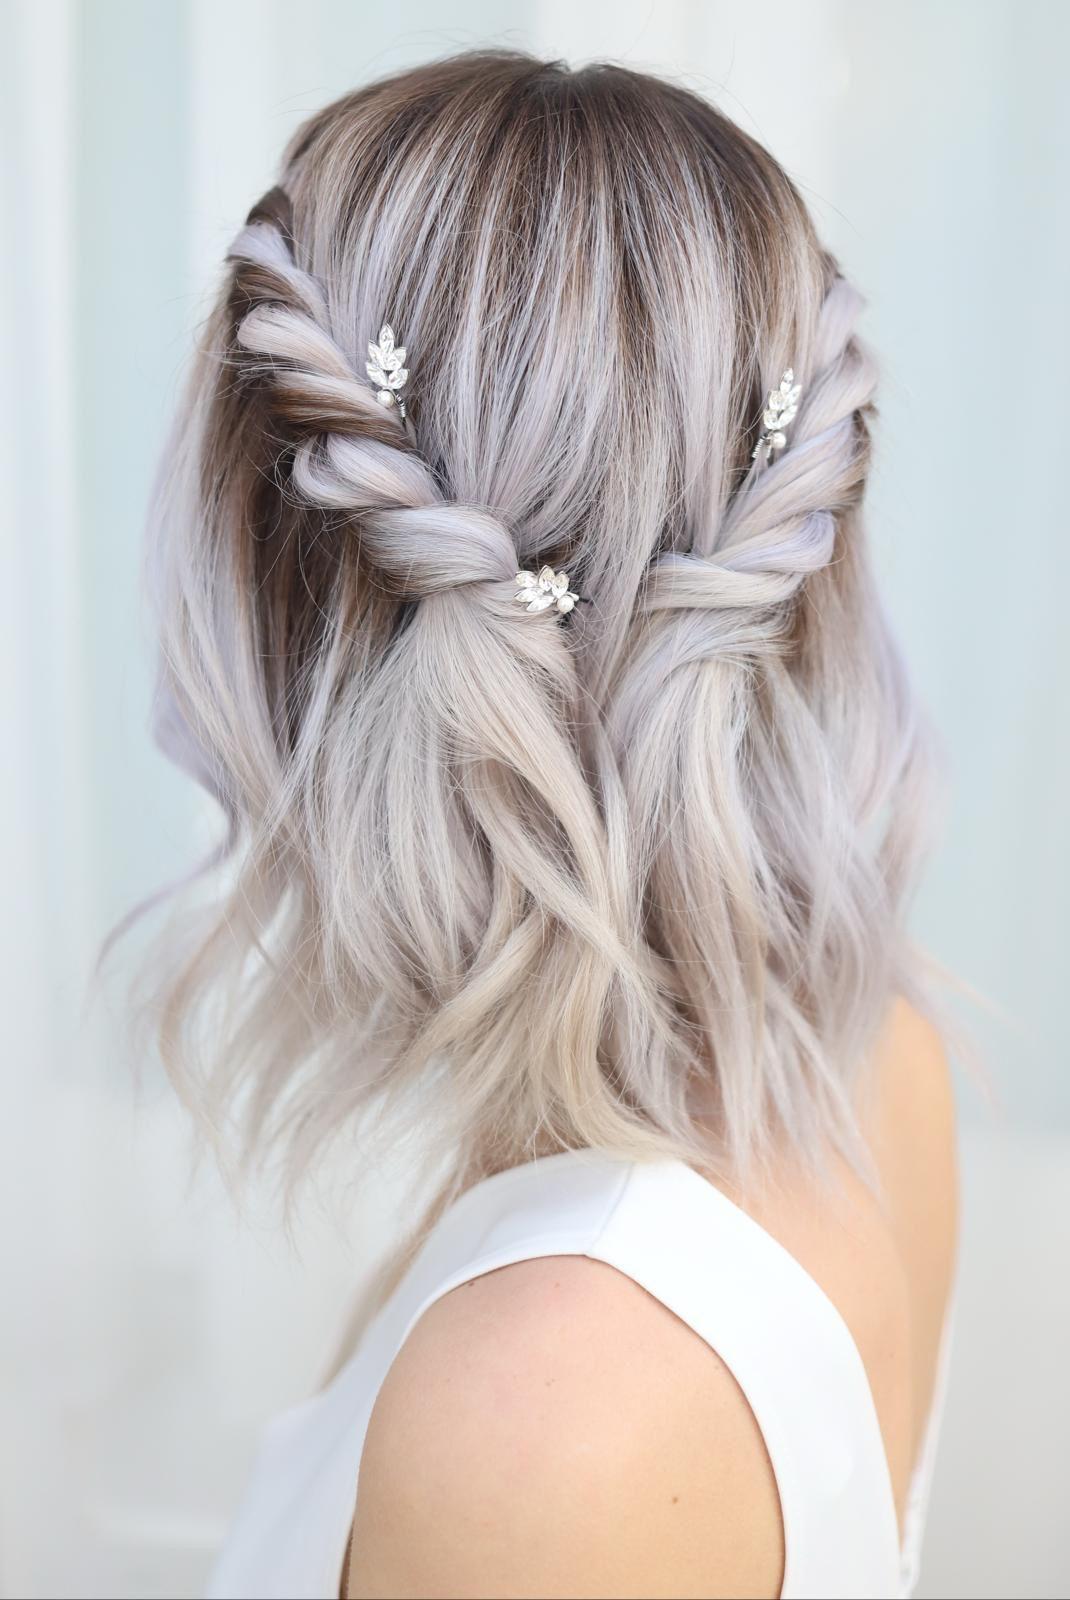 Half Up Down Style Bridesmaid Hair Updo Style In 2020 Prom Hairstyles For Short Hair Short Hair Updo Short Wedding Hair